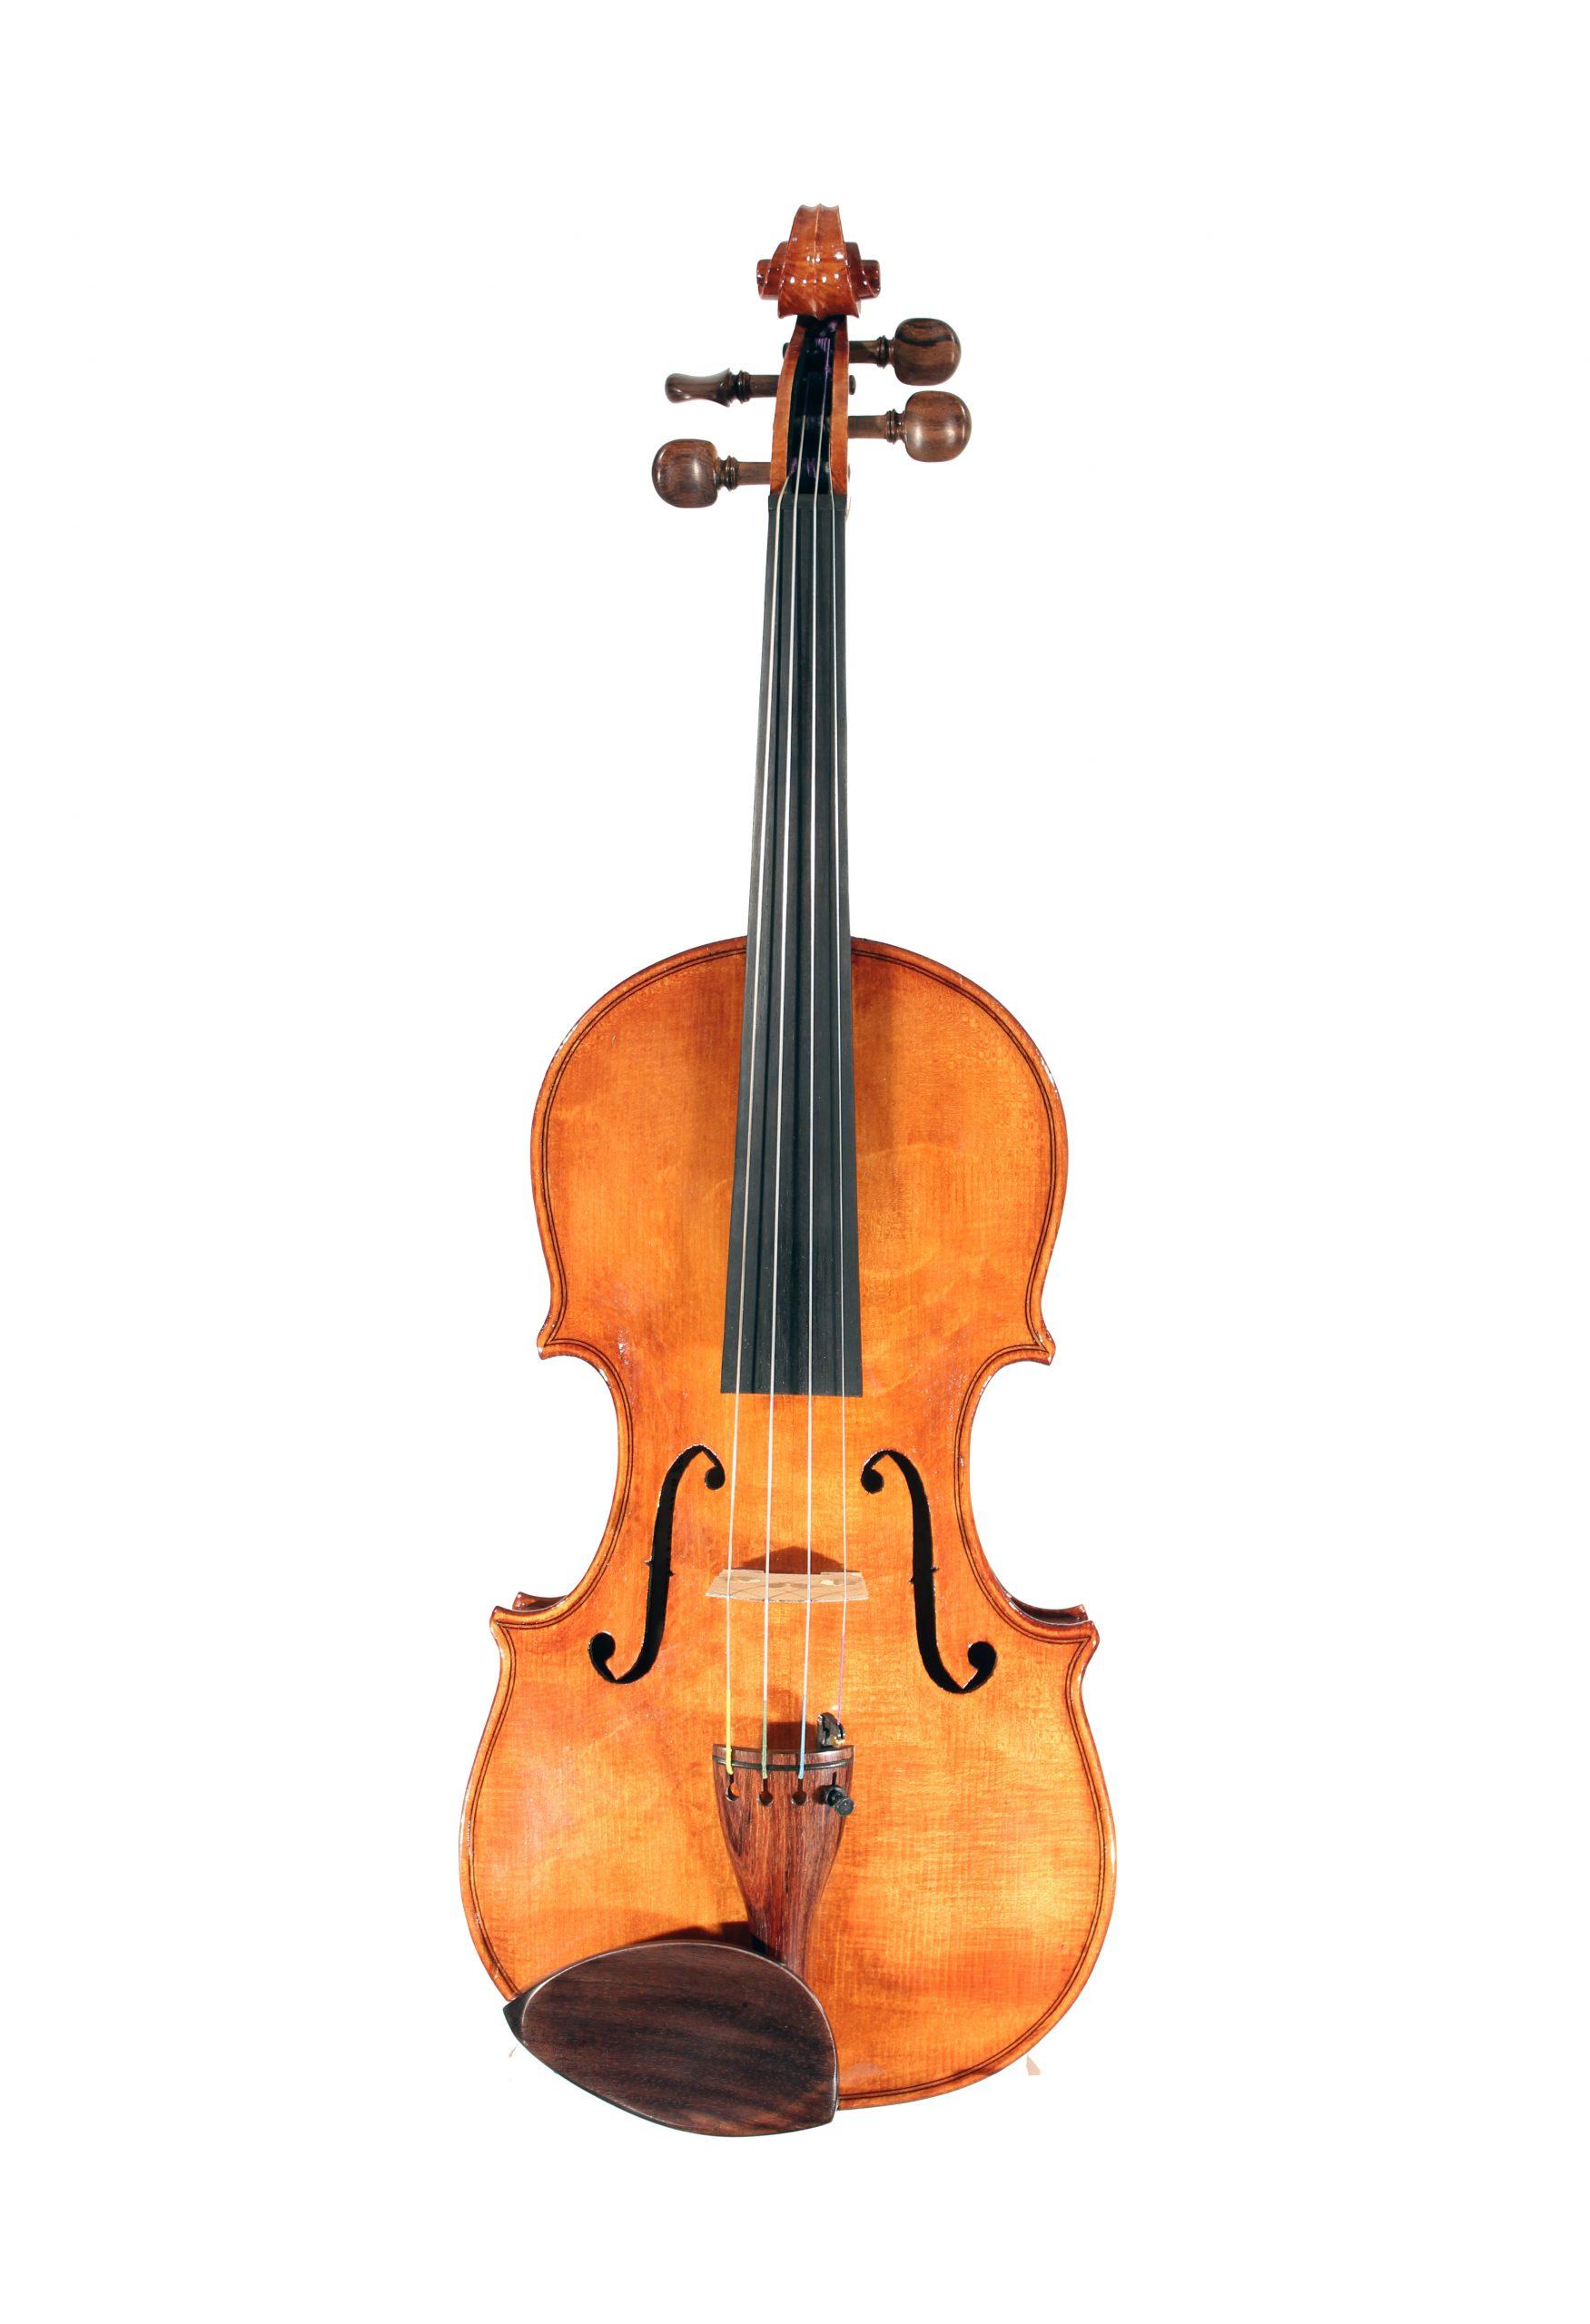 Violin by Fabio Chiari Florence 2015 for sale at Bridgewood and Neitzert London